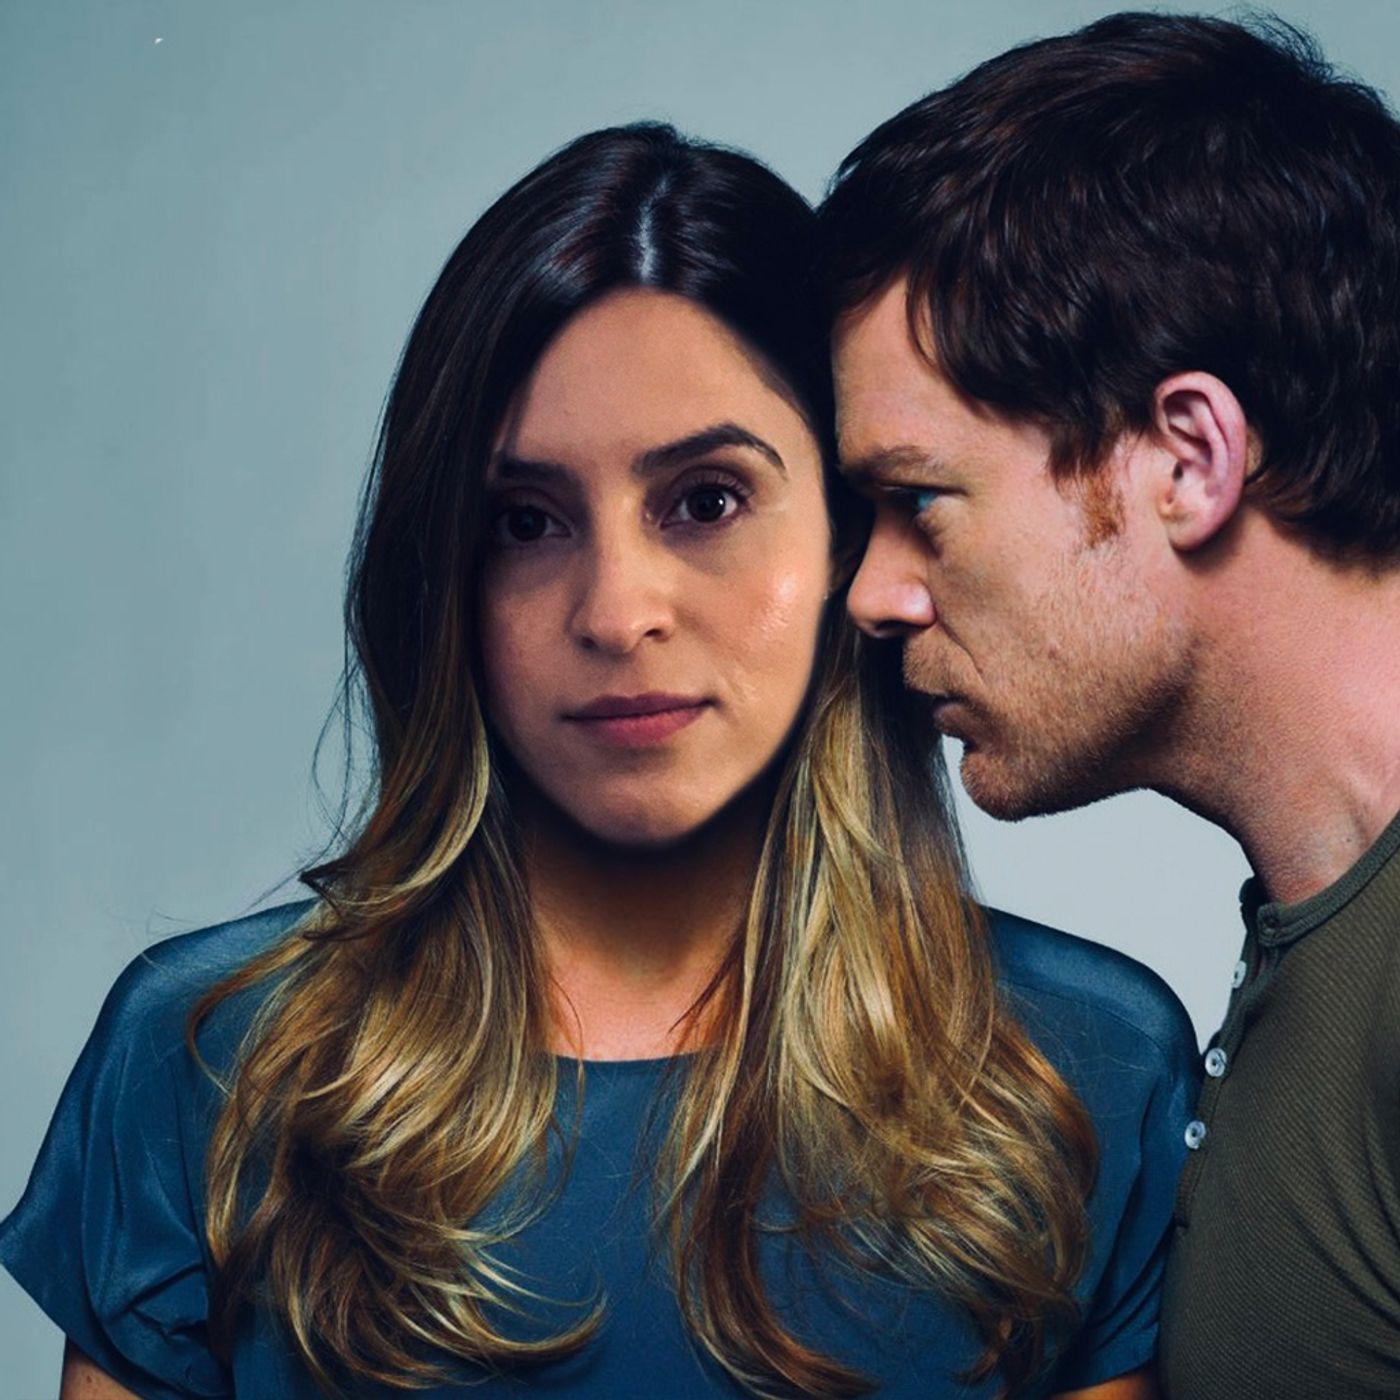 Full Show: Baby Dexter's new love